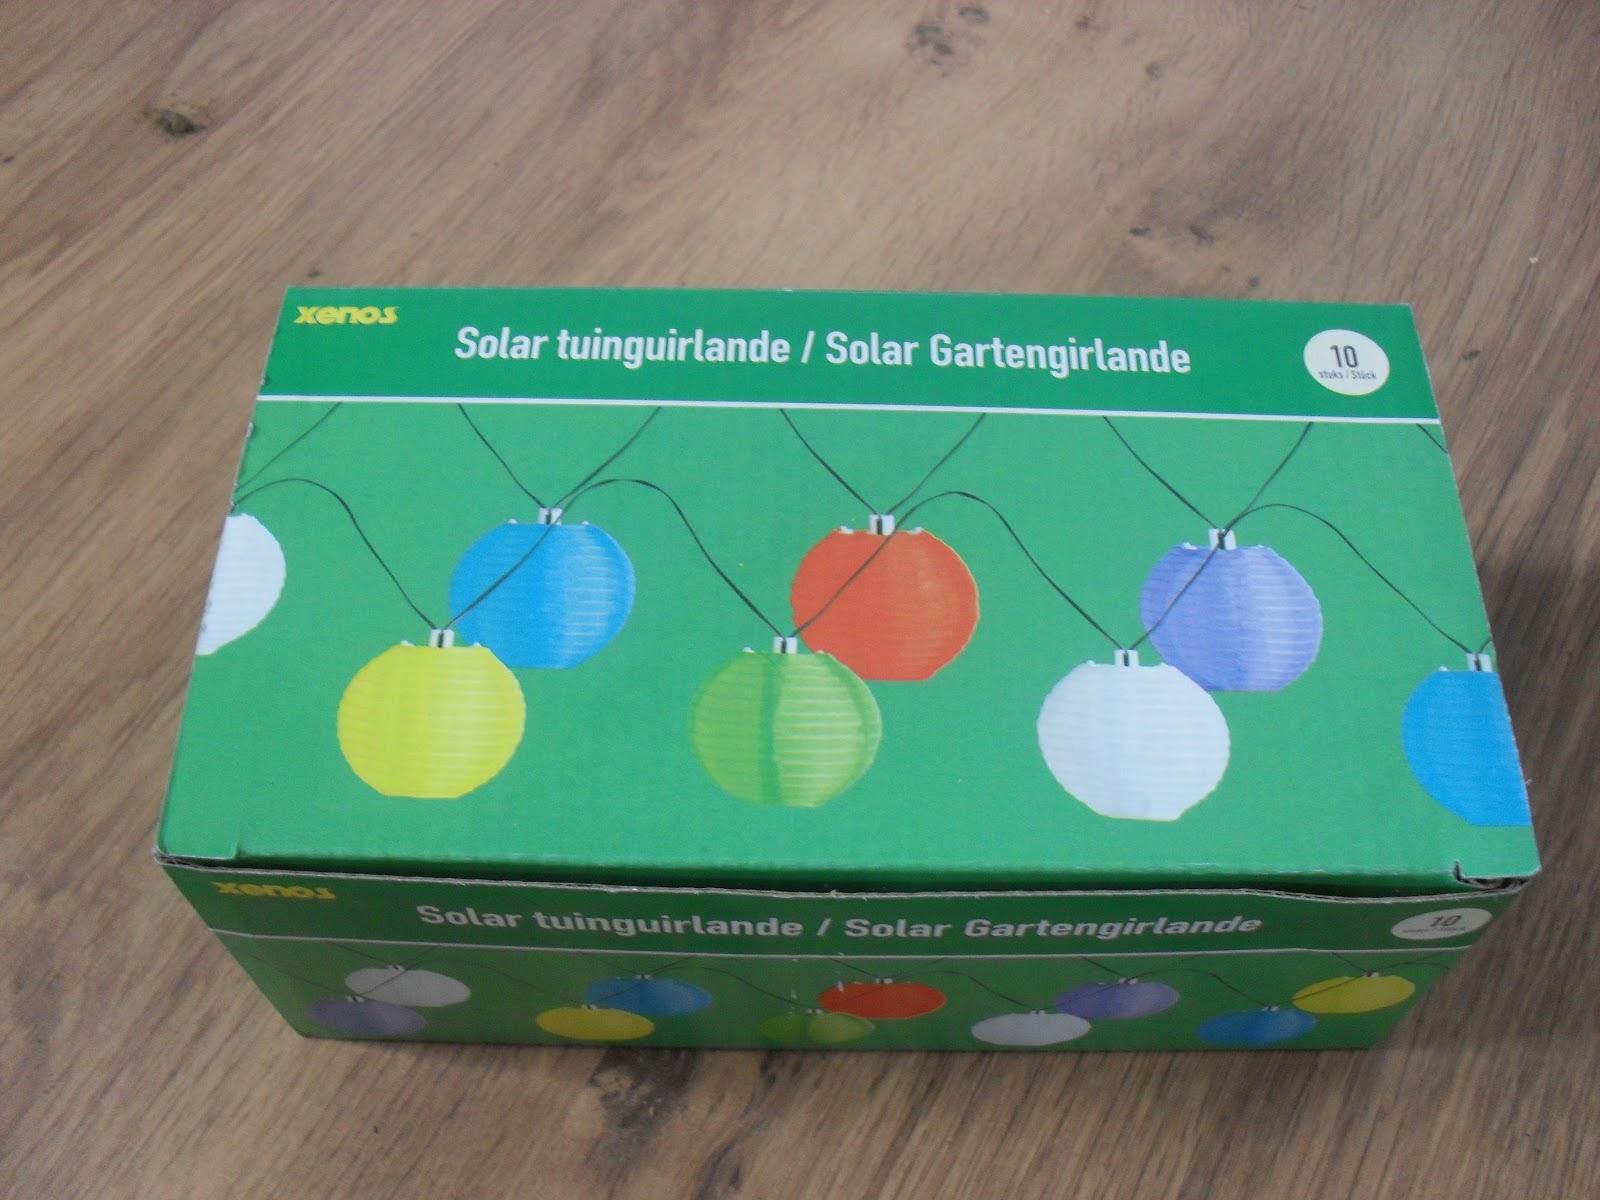 Marokkaanse Lampen Xenos : Kersttrui xmas tree met verlichting ml. kandelaar xenos kandelaar